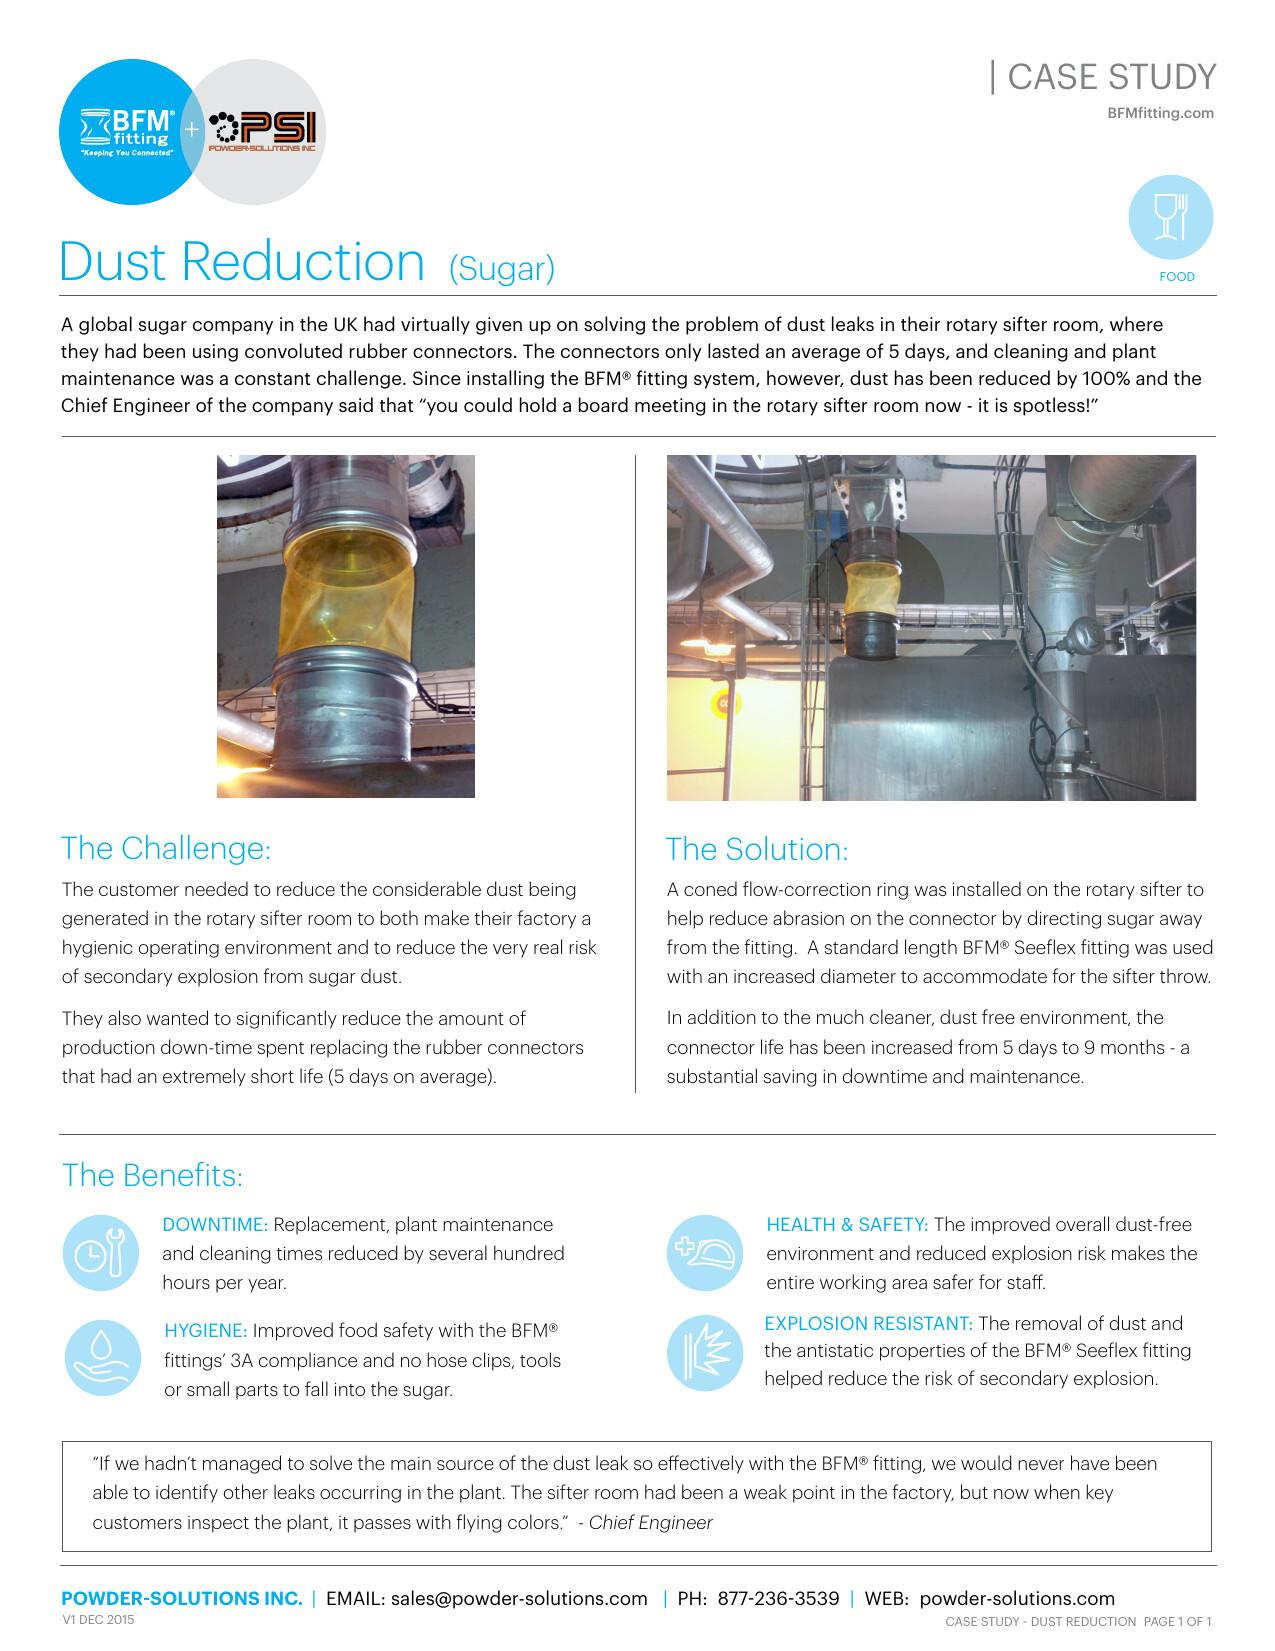 PSI BFM Case Study Dust Reduction (Sugar) V1 Dec 2015